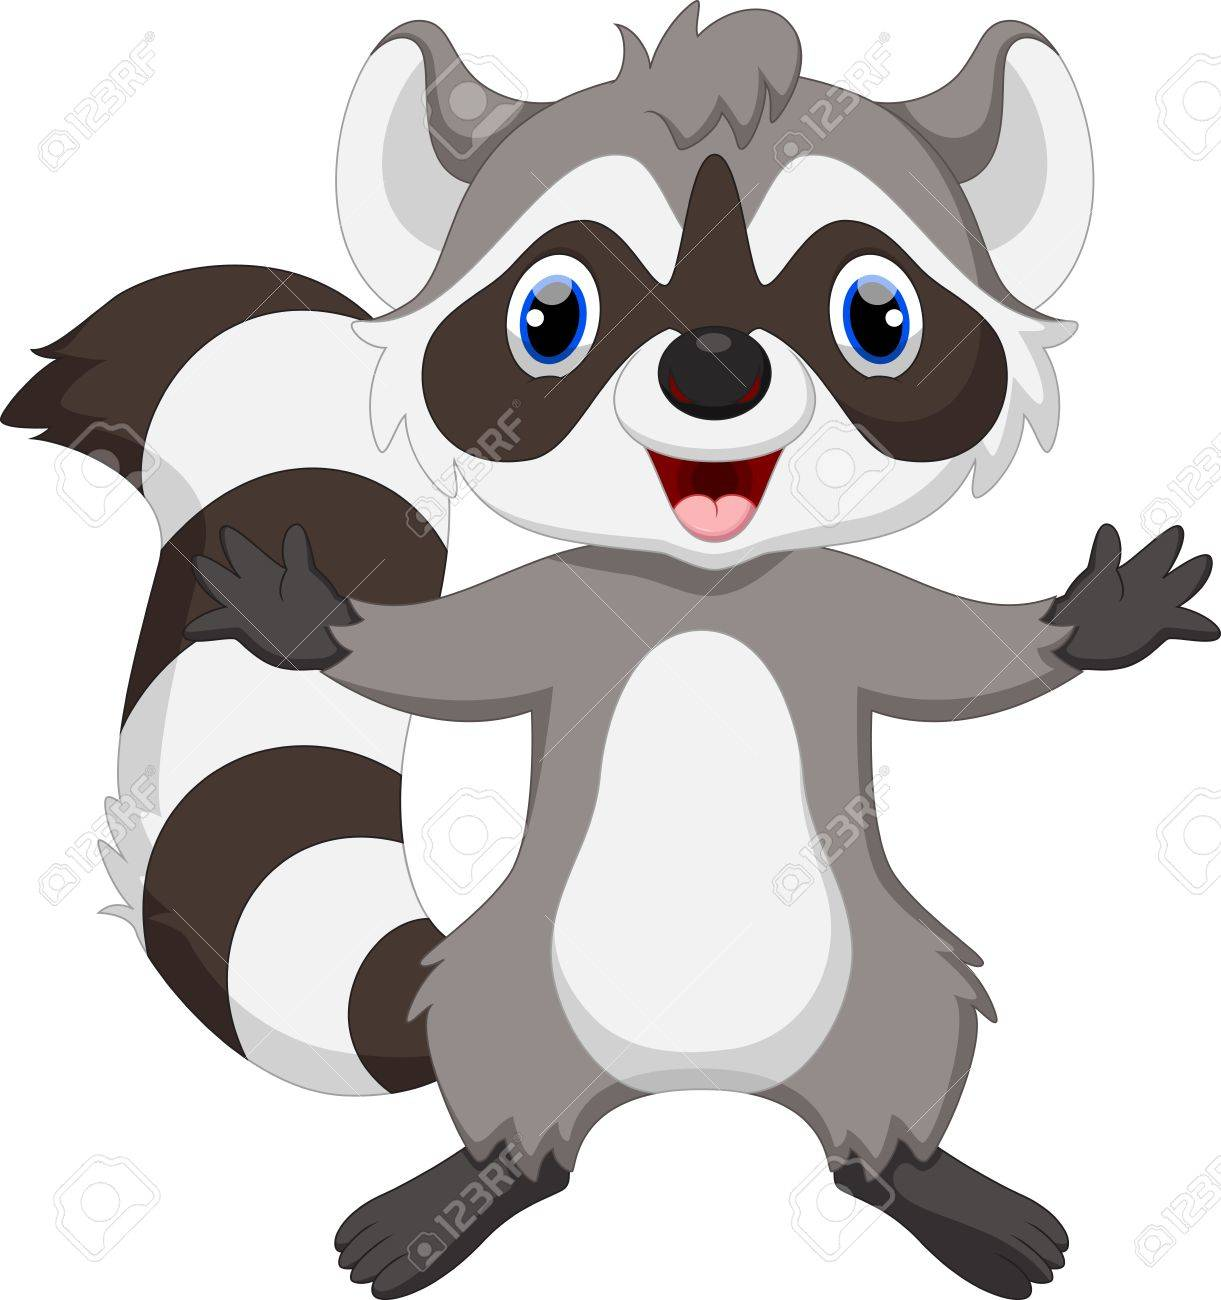 Cute raccoon cartoon waving.